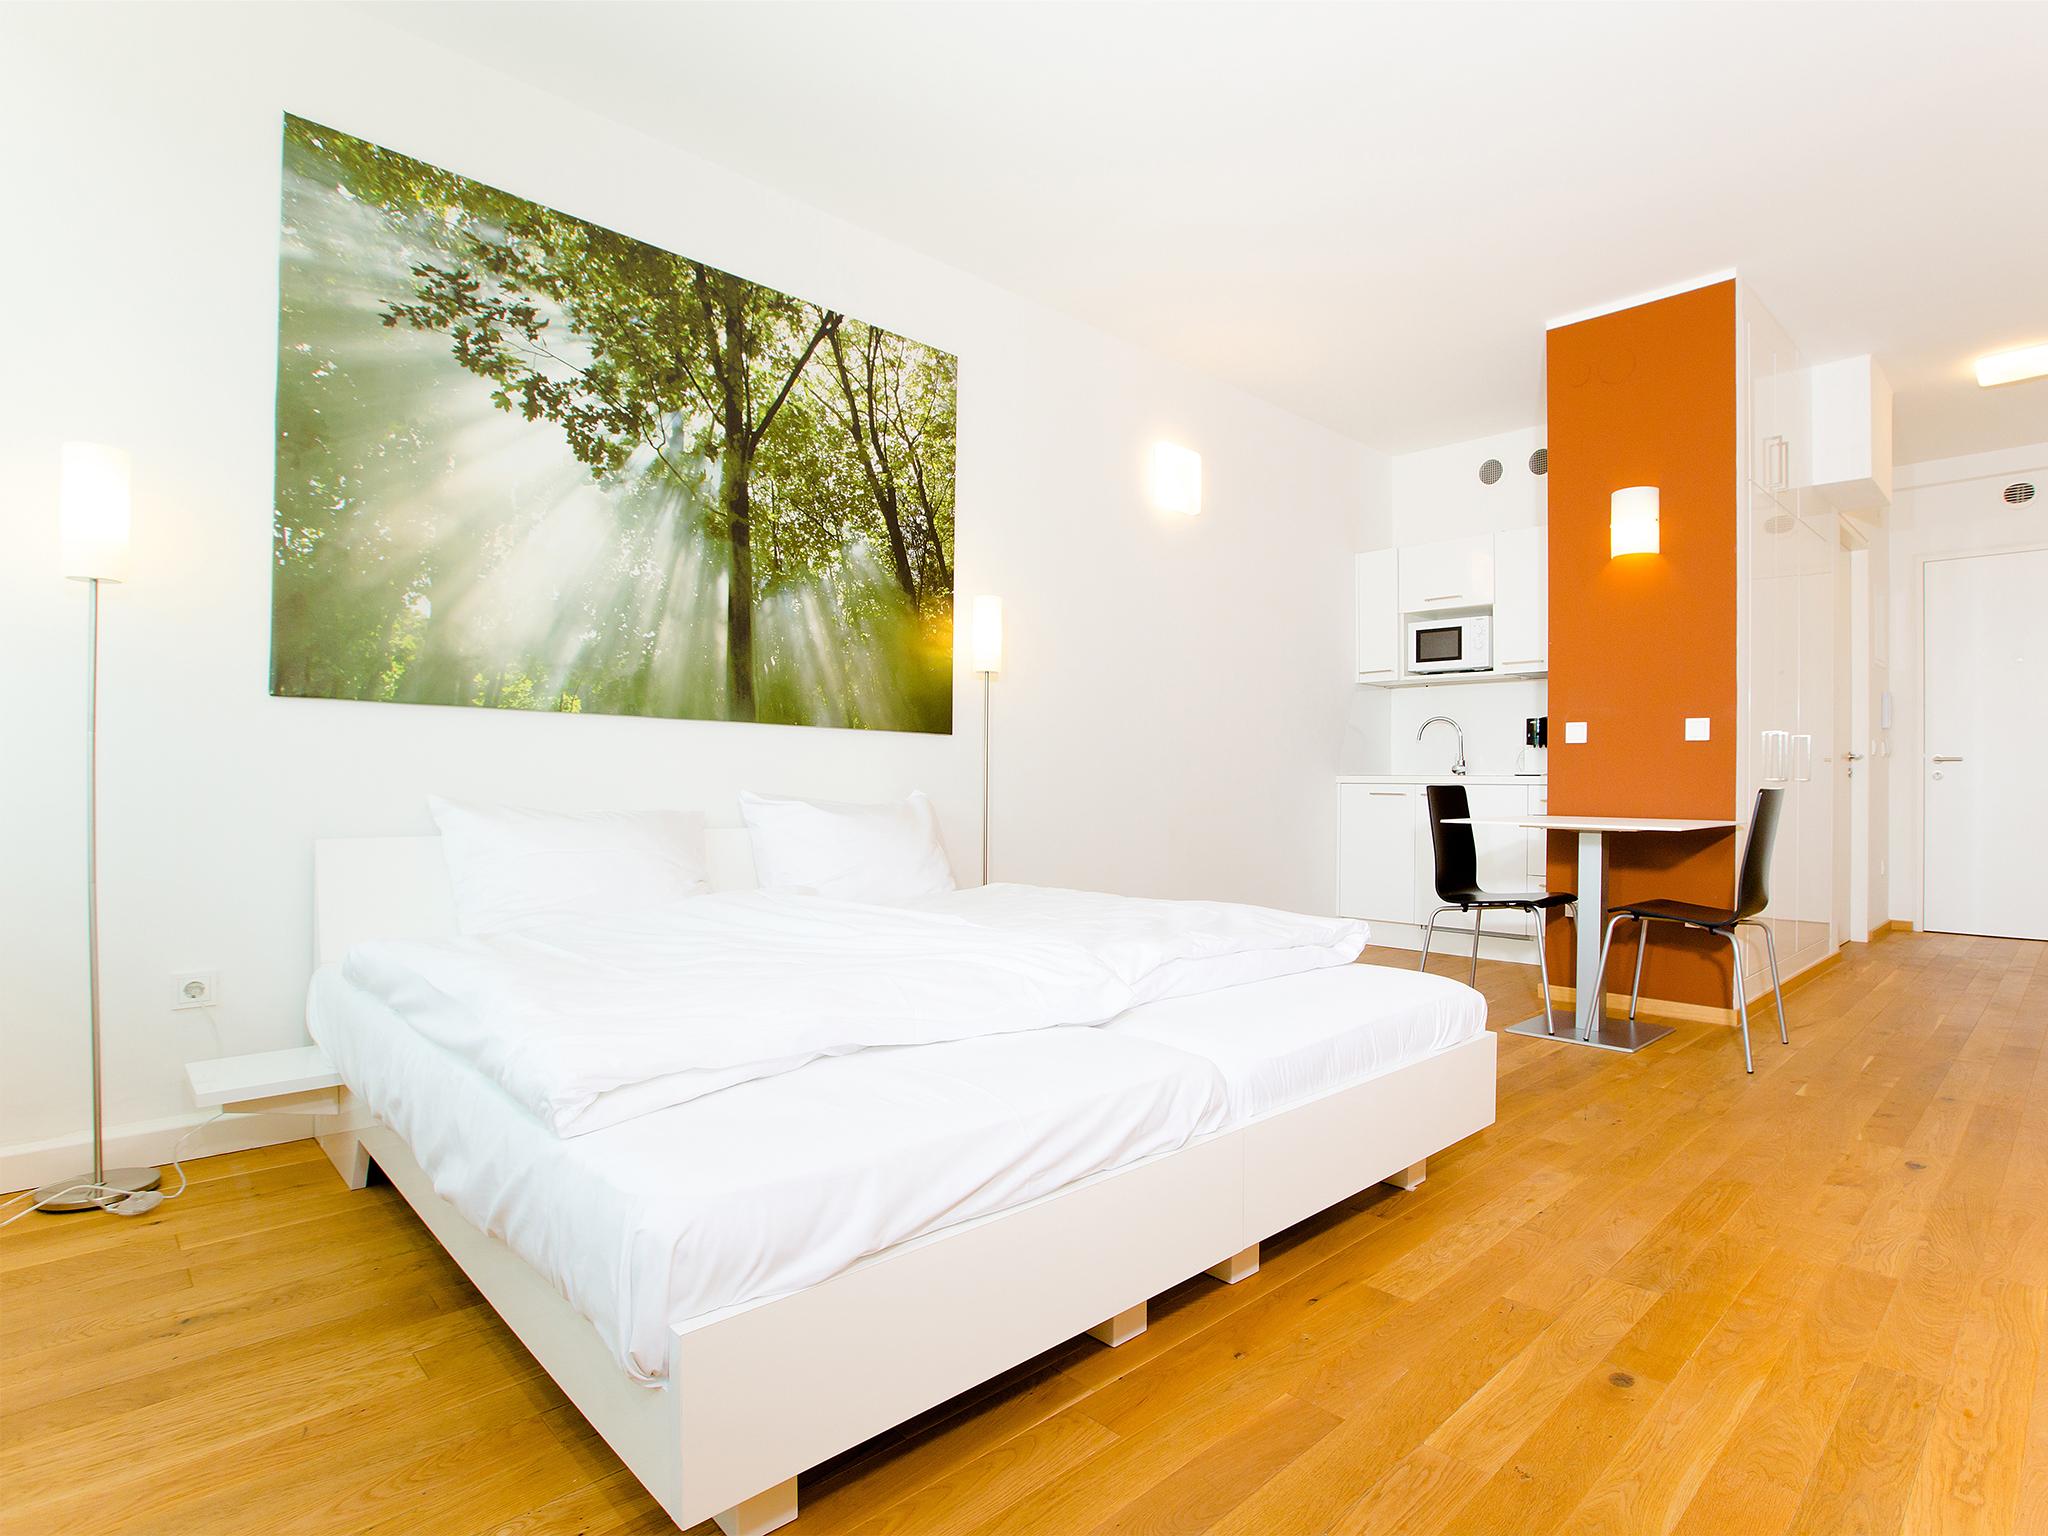 Apartment Erde Wohnraum Hauptfoto